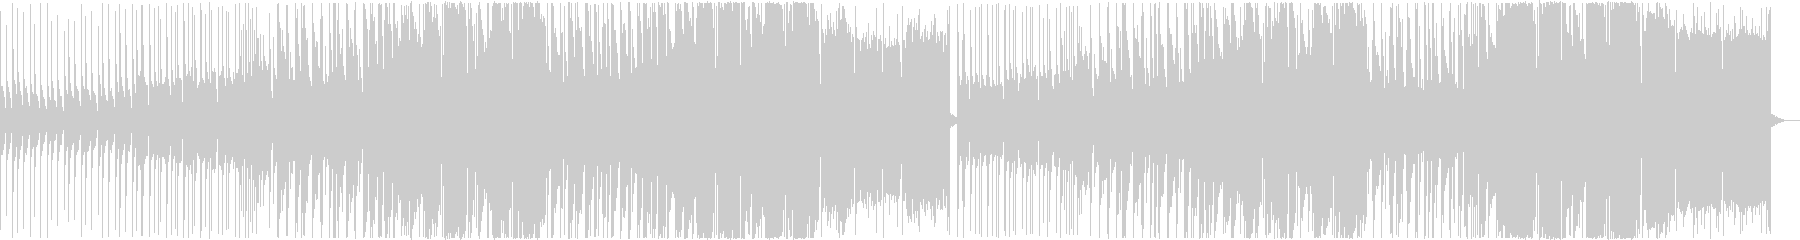 EDM系 明るくスポーティな曲 -3の未再生の波形